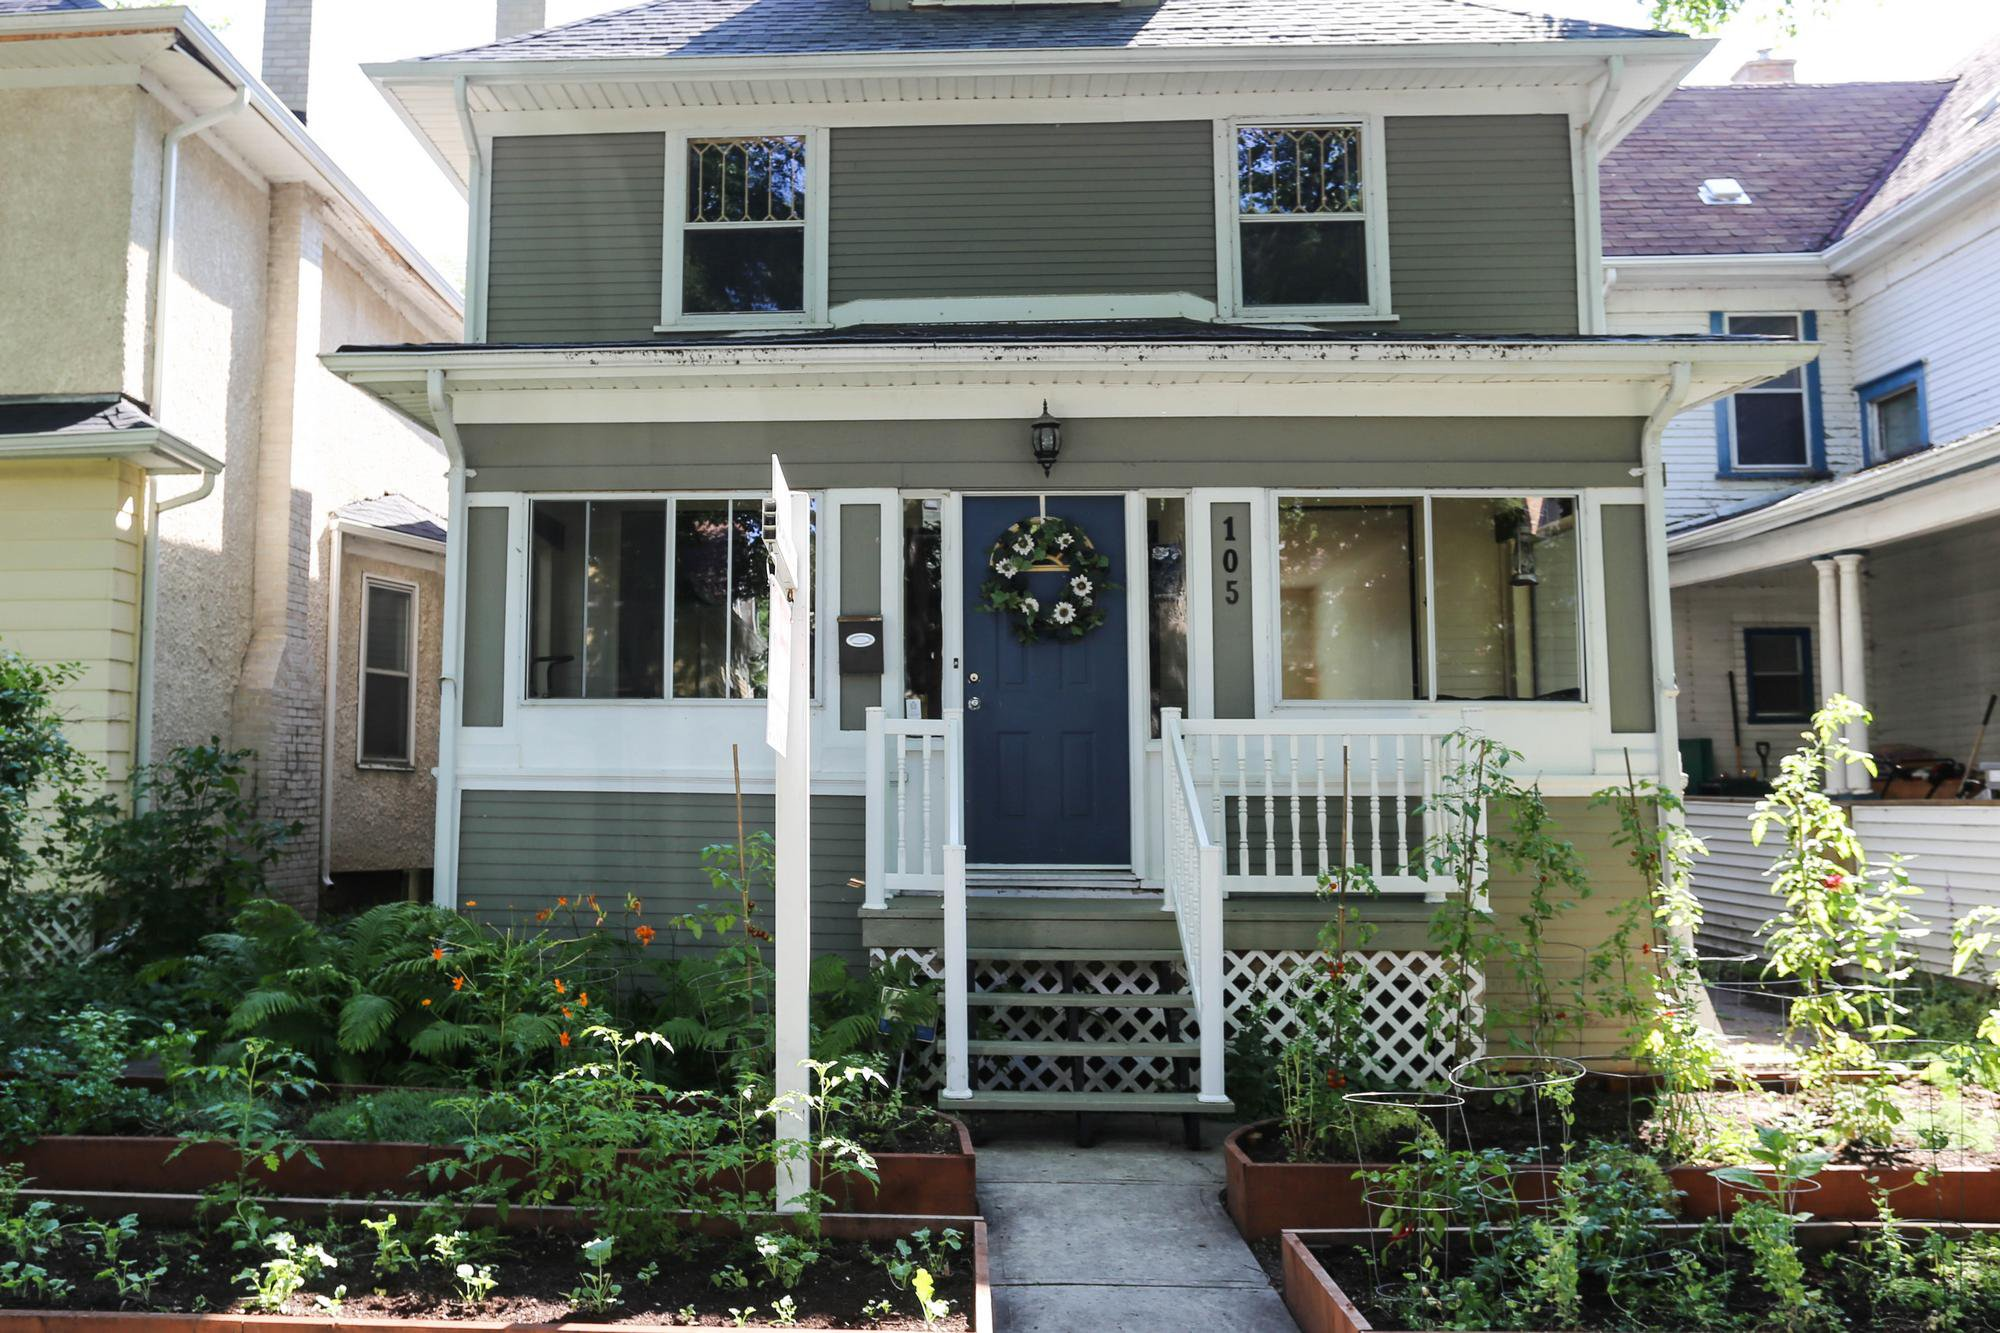 Photo 3: Photos: 105 Evanson Street in Winnipeg: Wolseley Single Family Detached for sale (5B)  : MLS®# 1821900